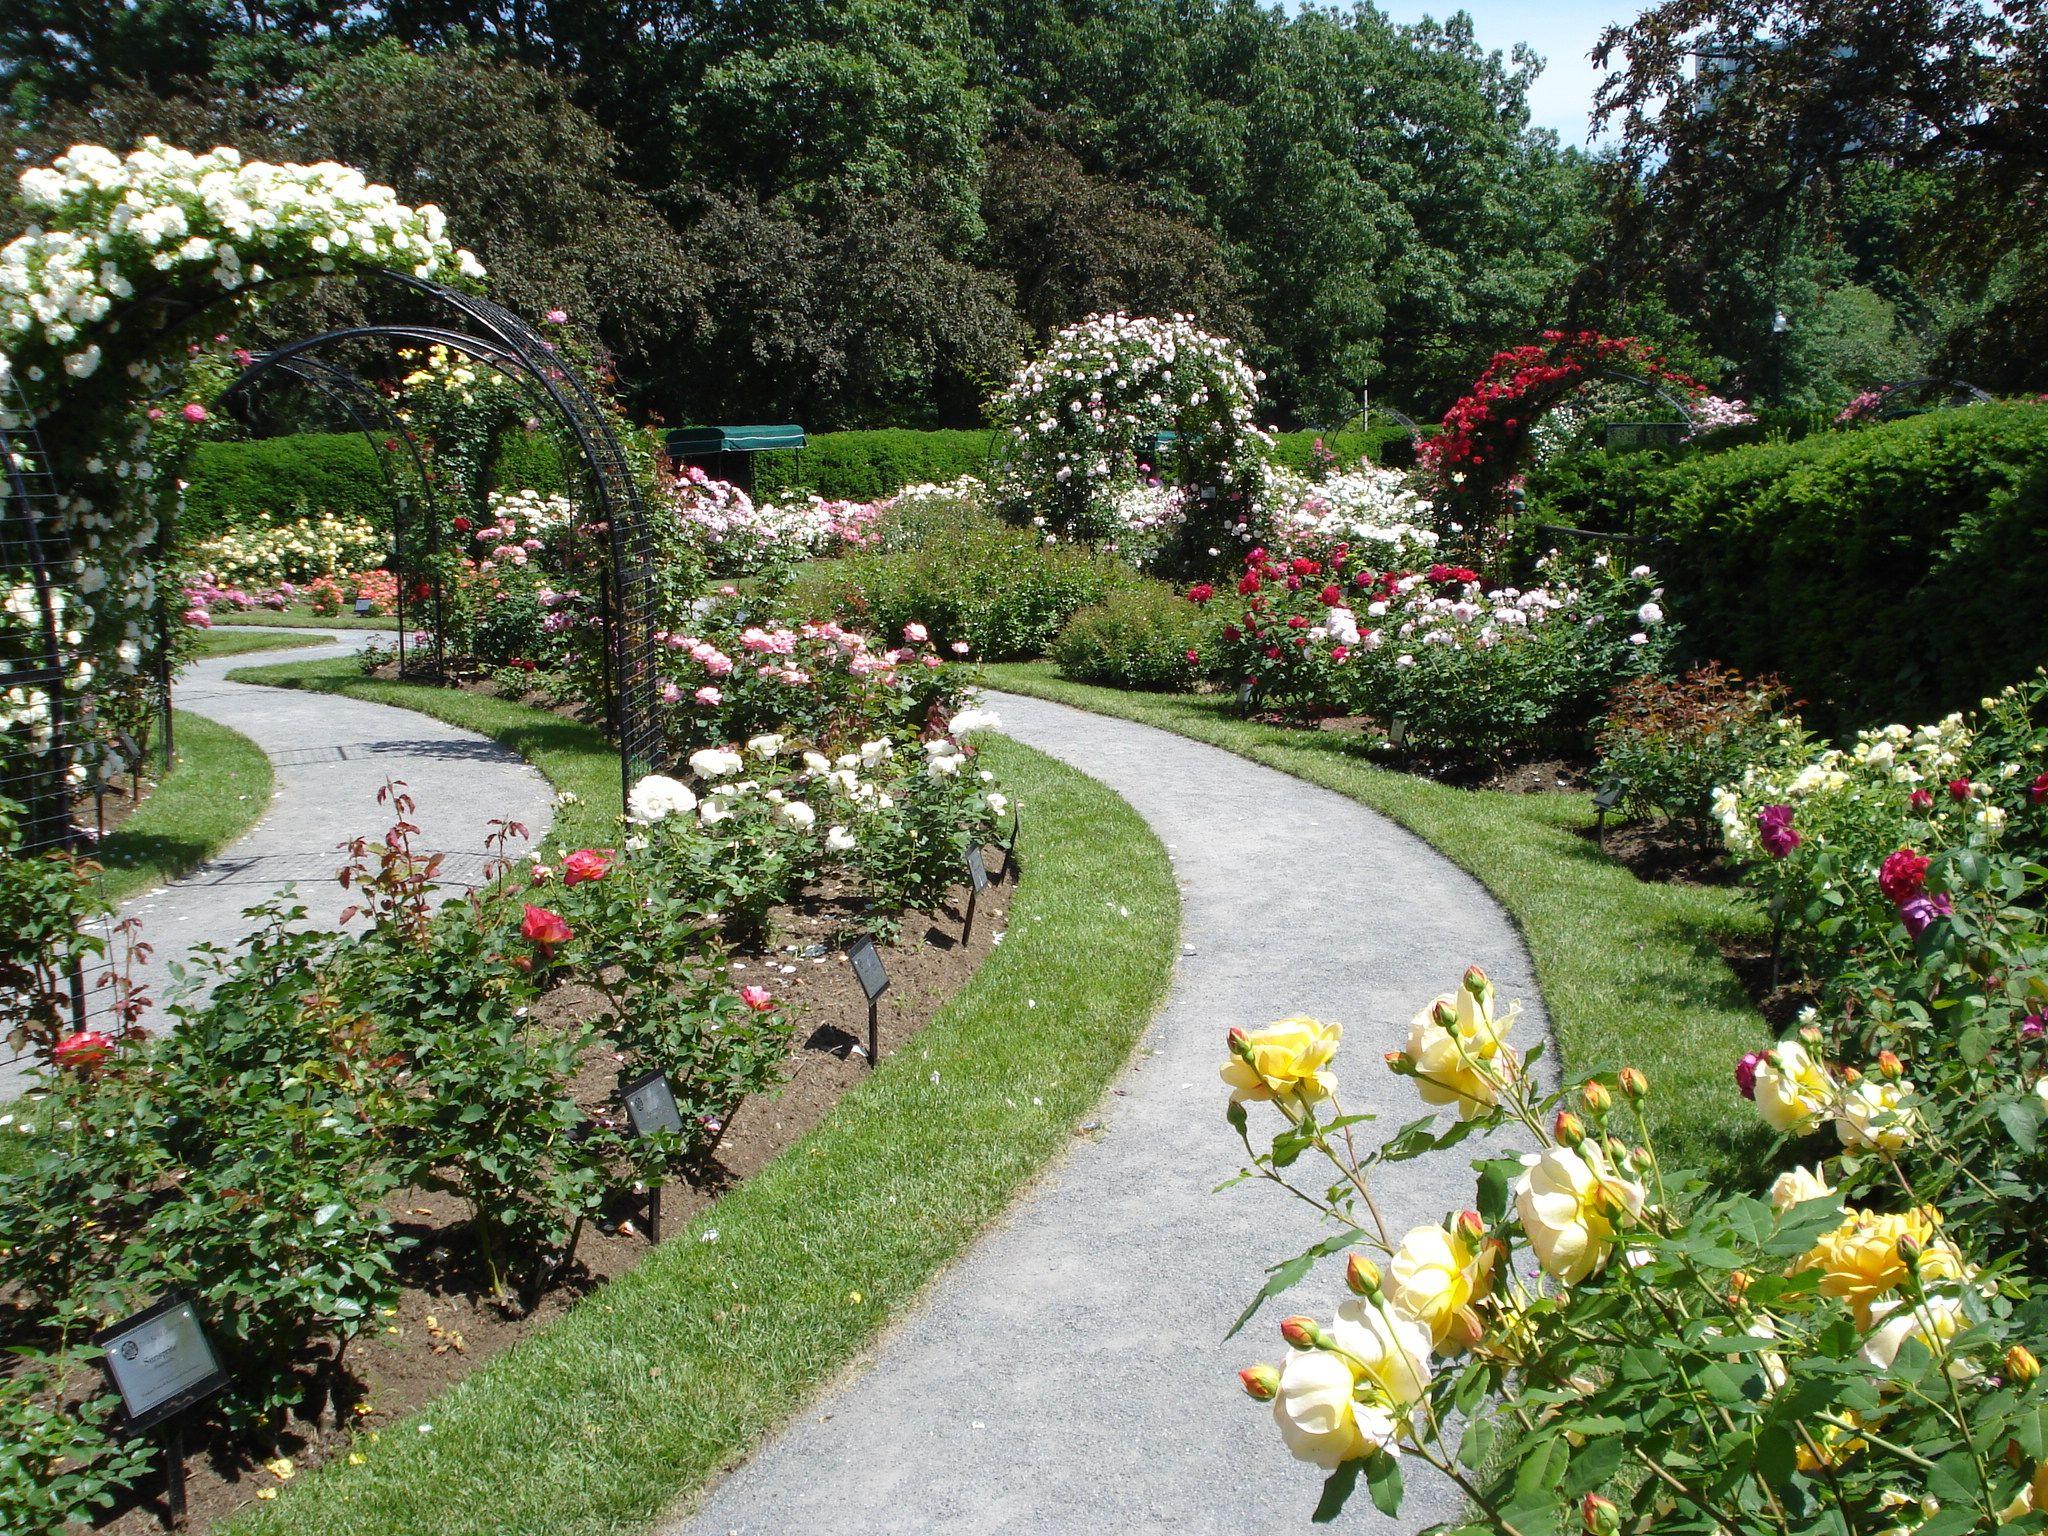 kelleher rose garden back bay fens photo by don eunson play in